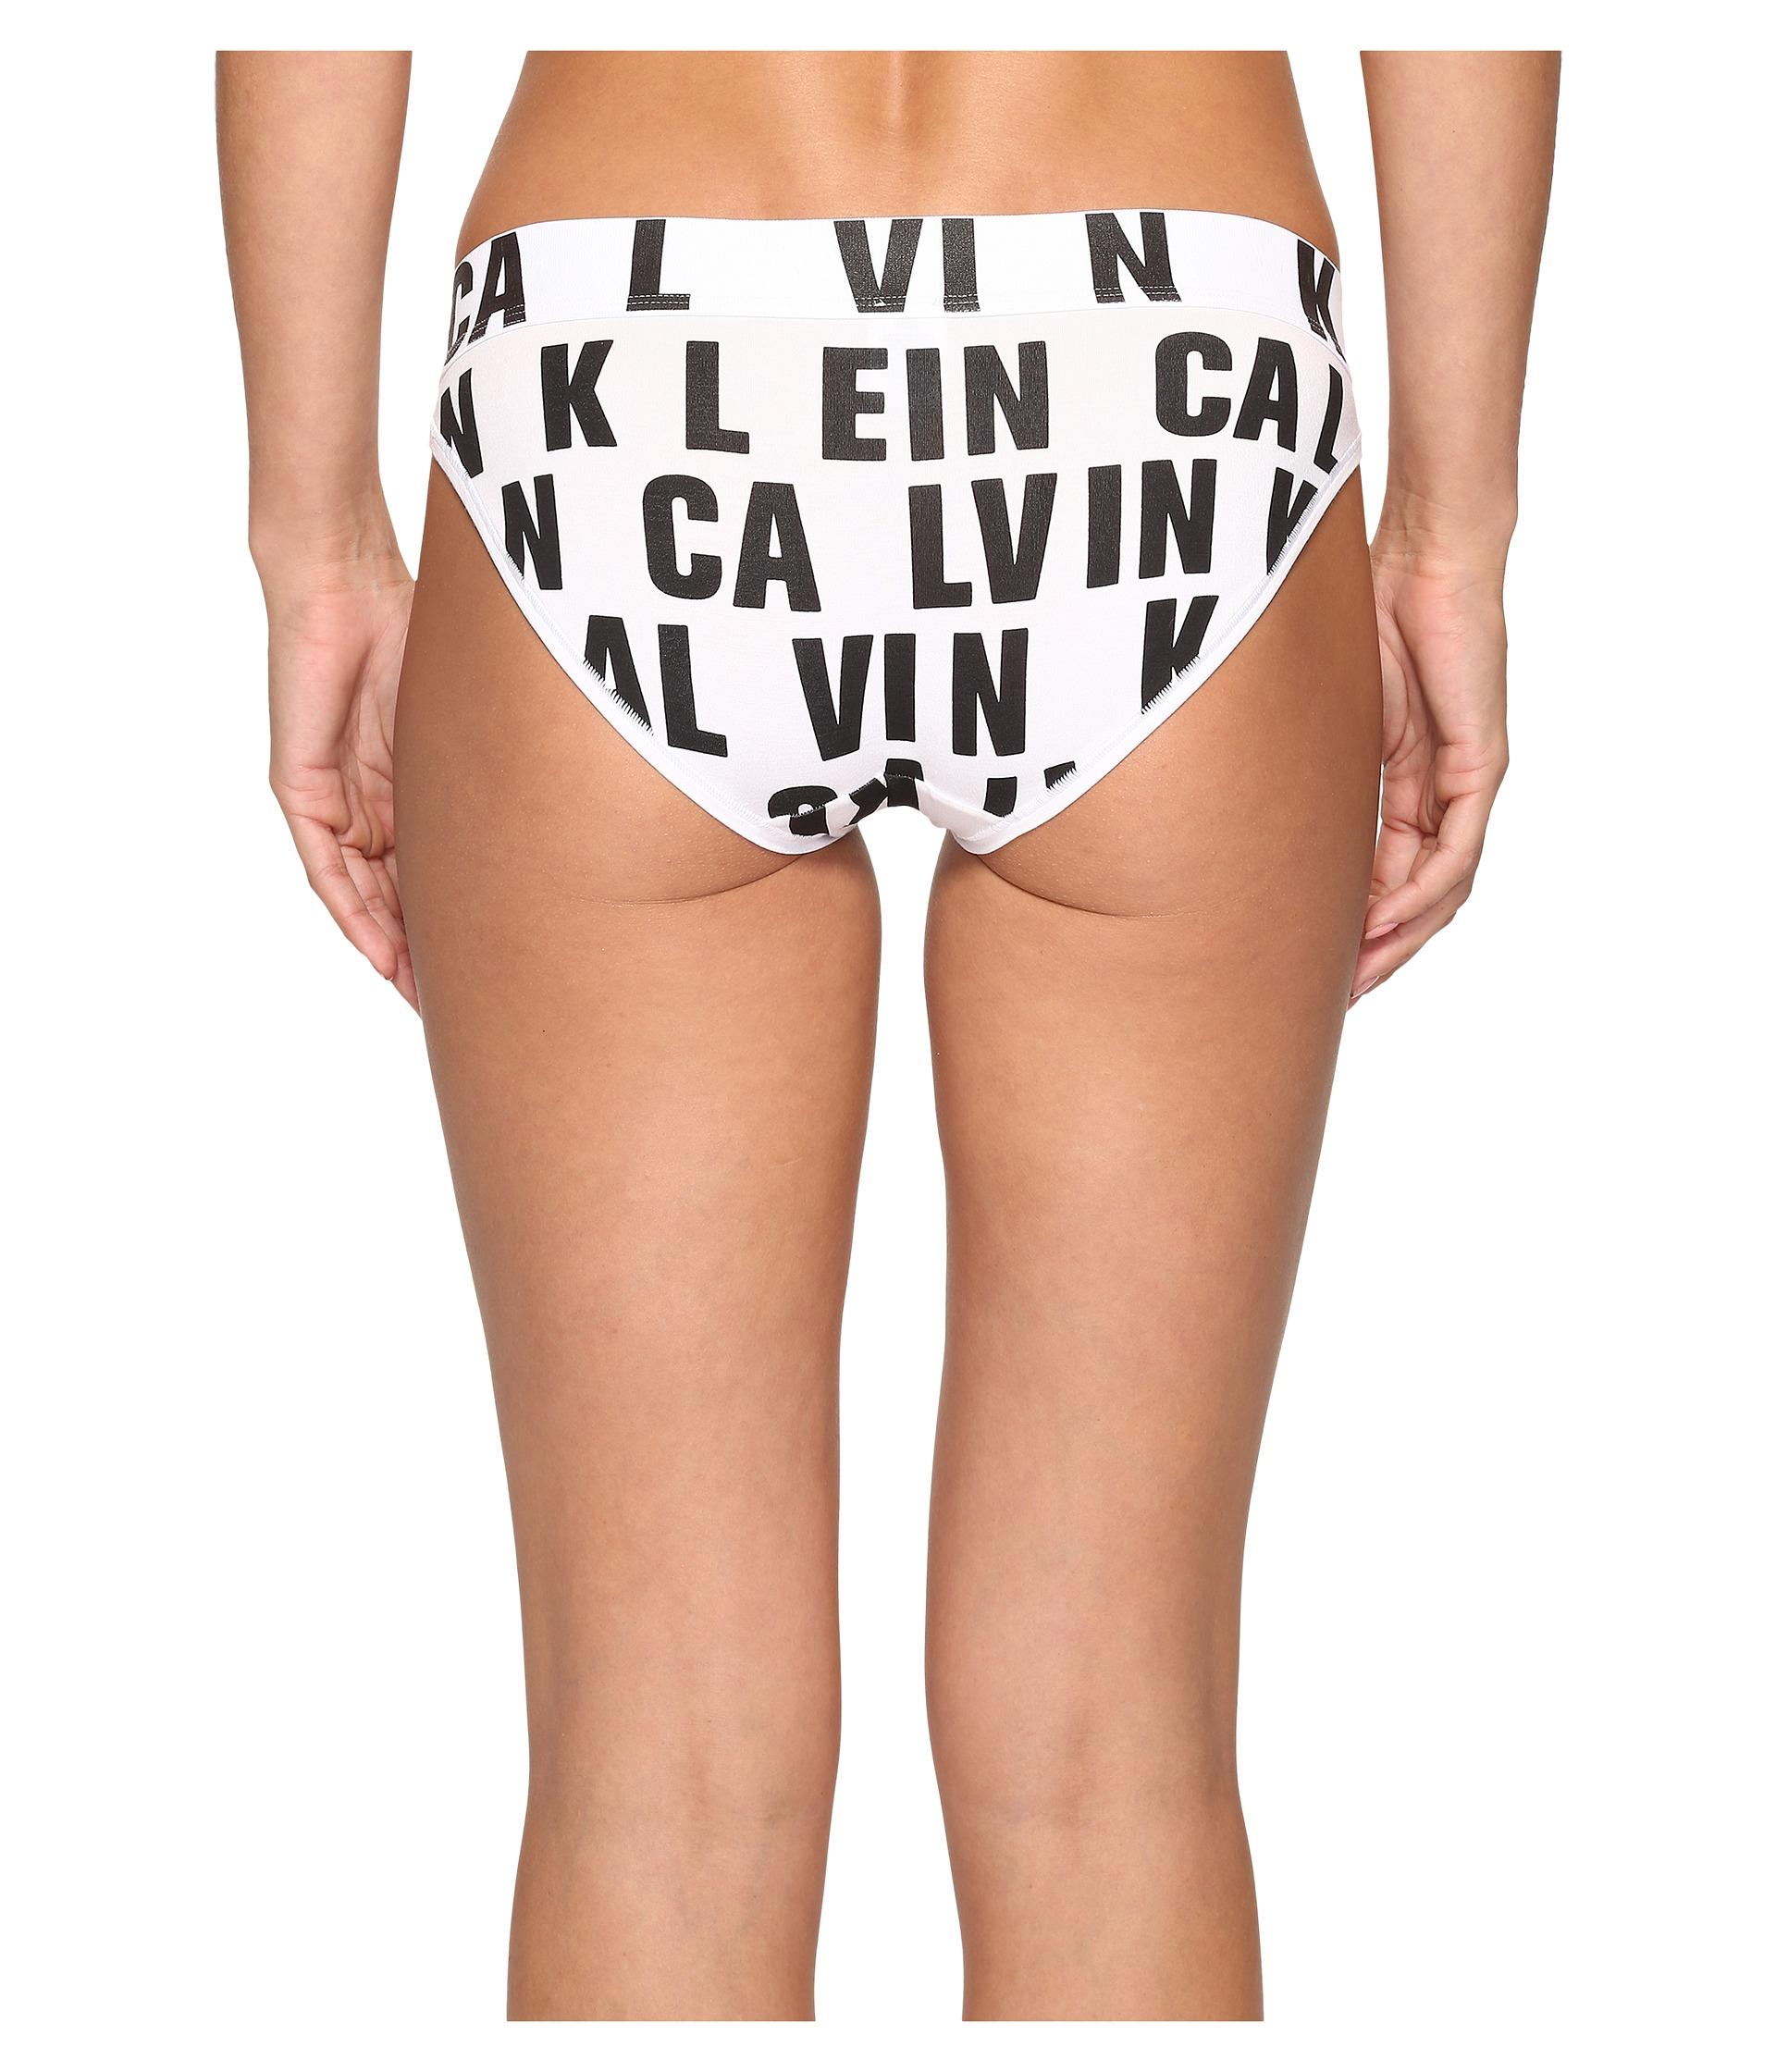 Calvin klein signature logo bikini sale happy see